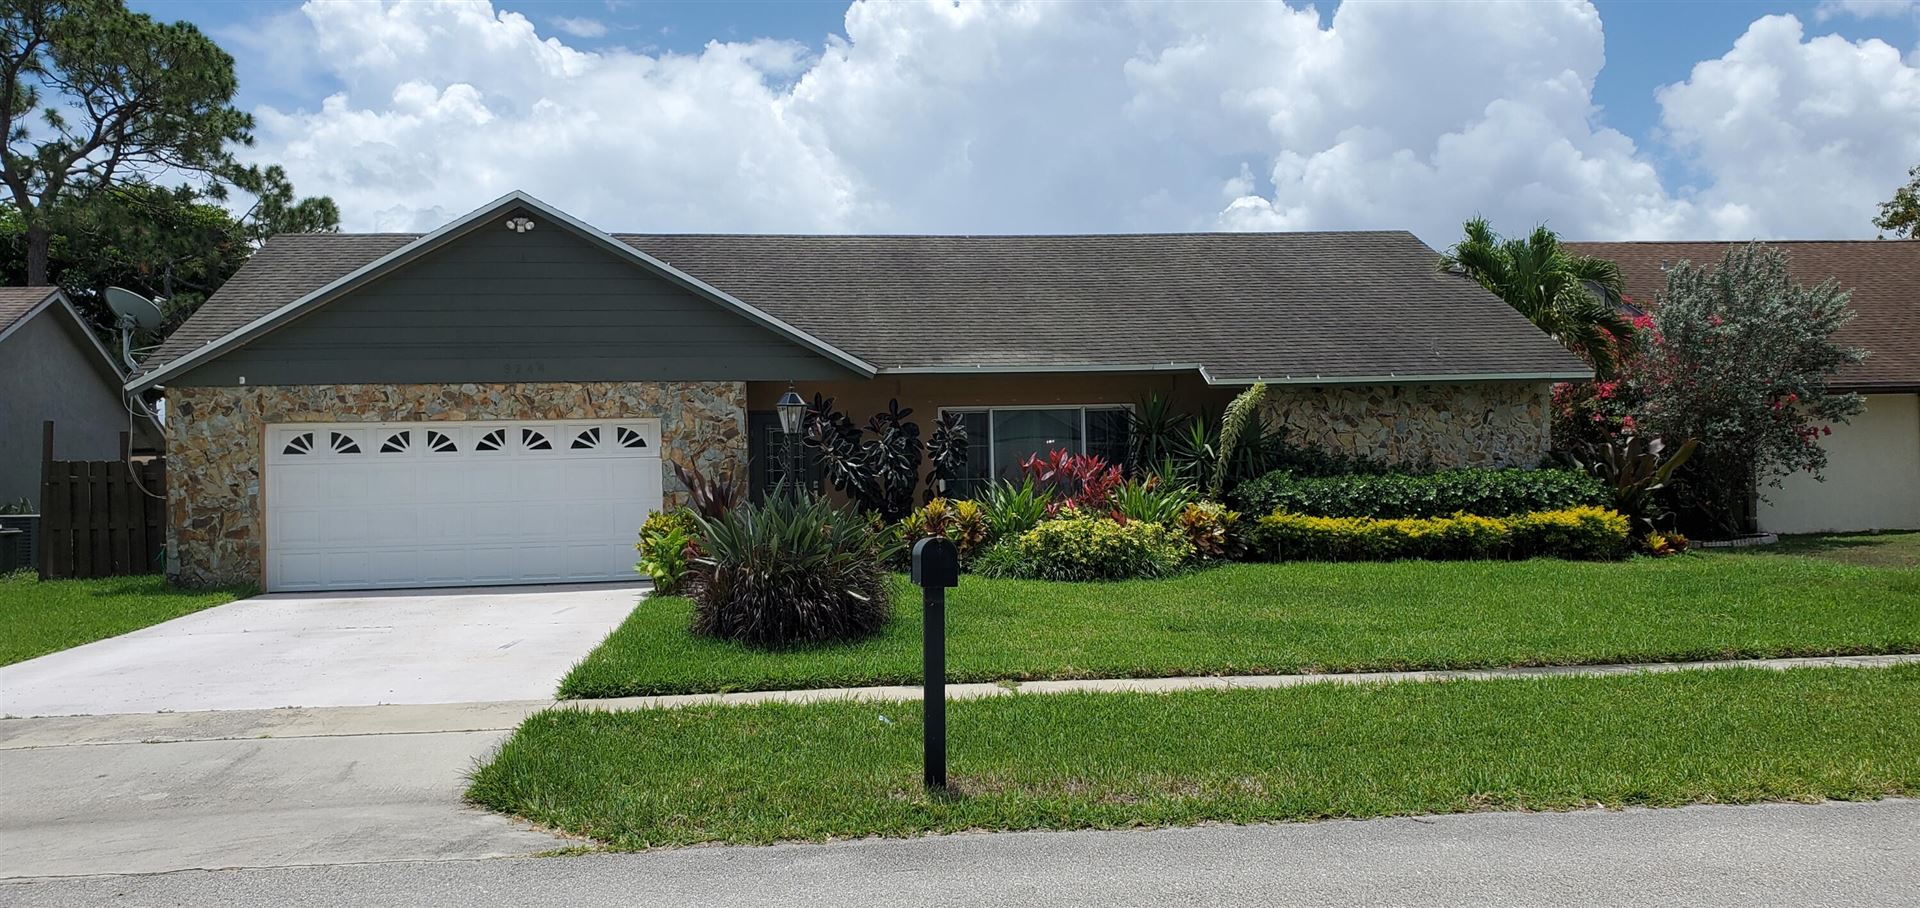 8244 Winnipesaukee Way, Lake Worth, FL 33467 - MLS#: RX-10714907